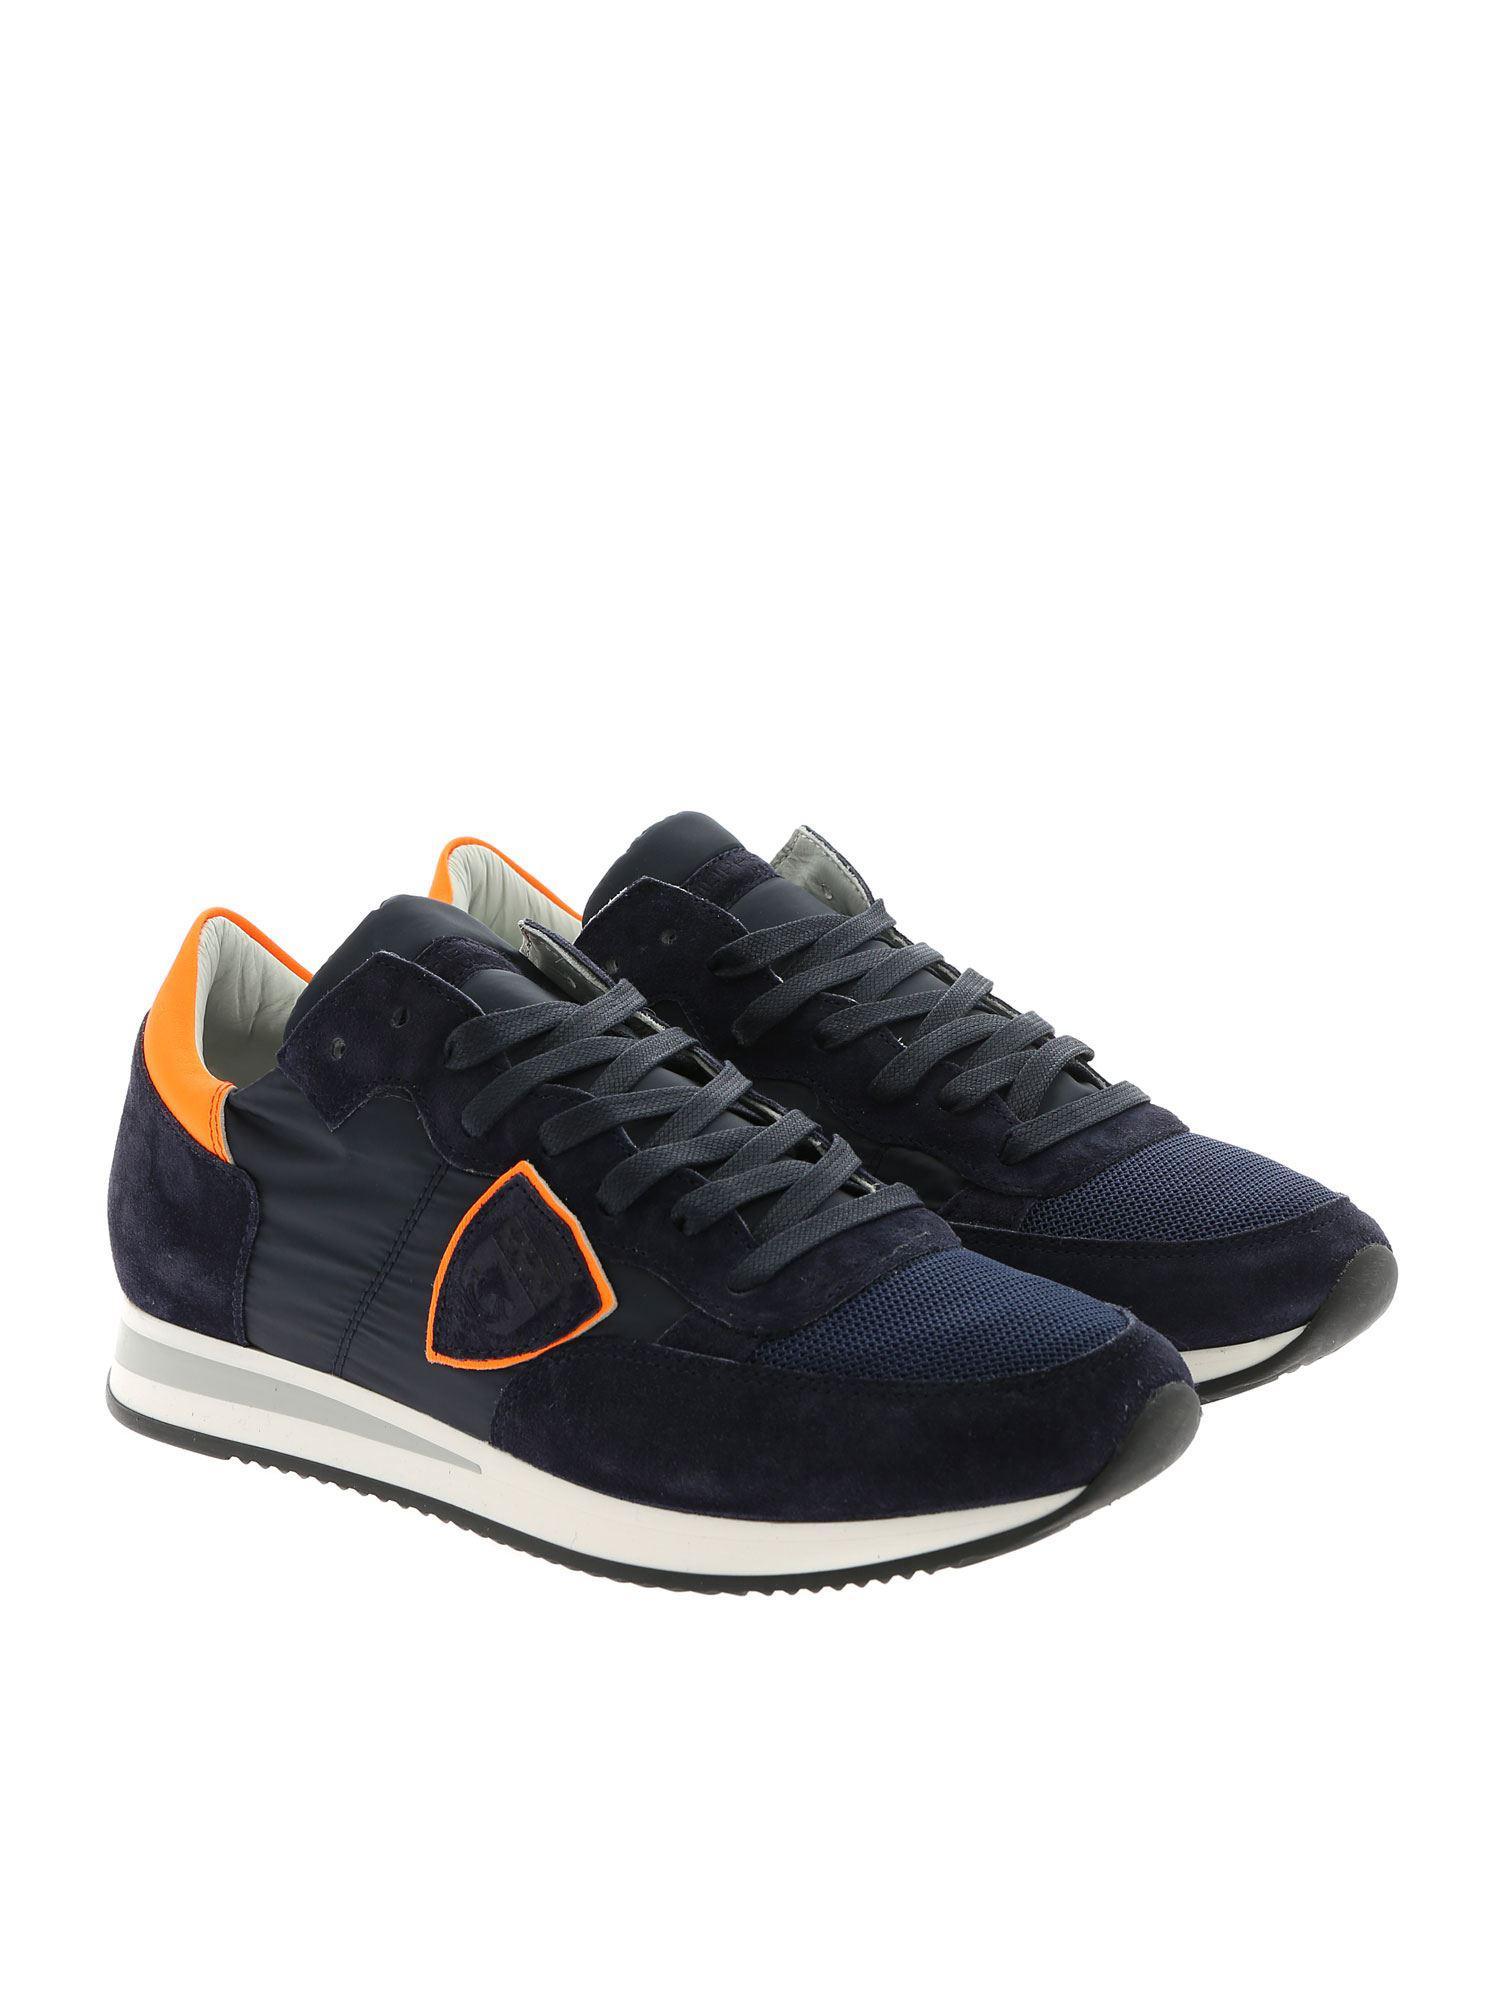 2936c093c94 philippe-model-blue-Tropez-L-Blue-Sneakers-With-Neon-Orange-Detail.jpeg